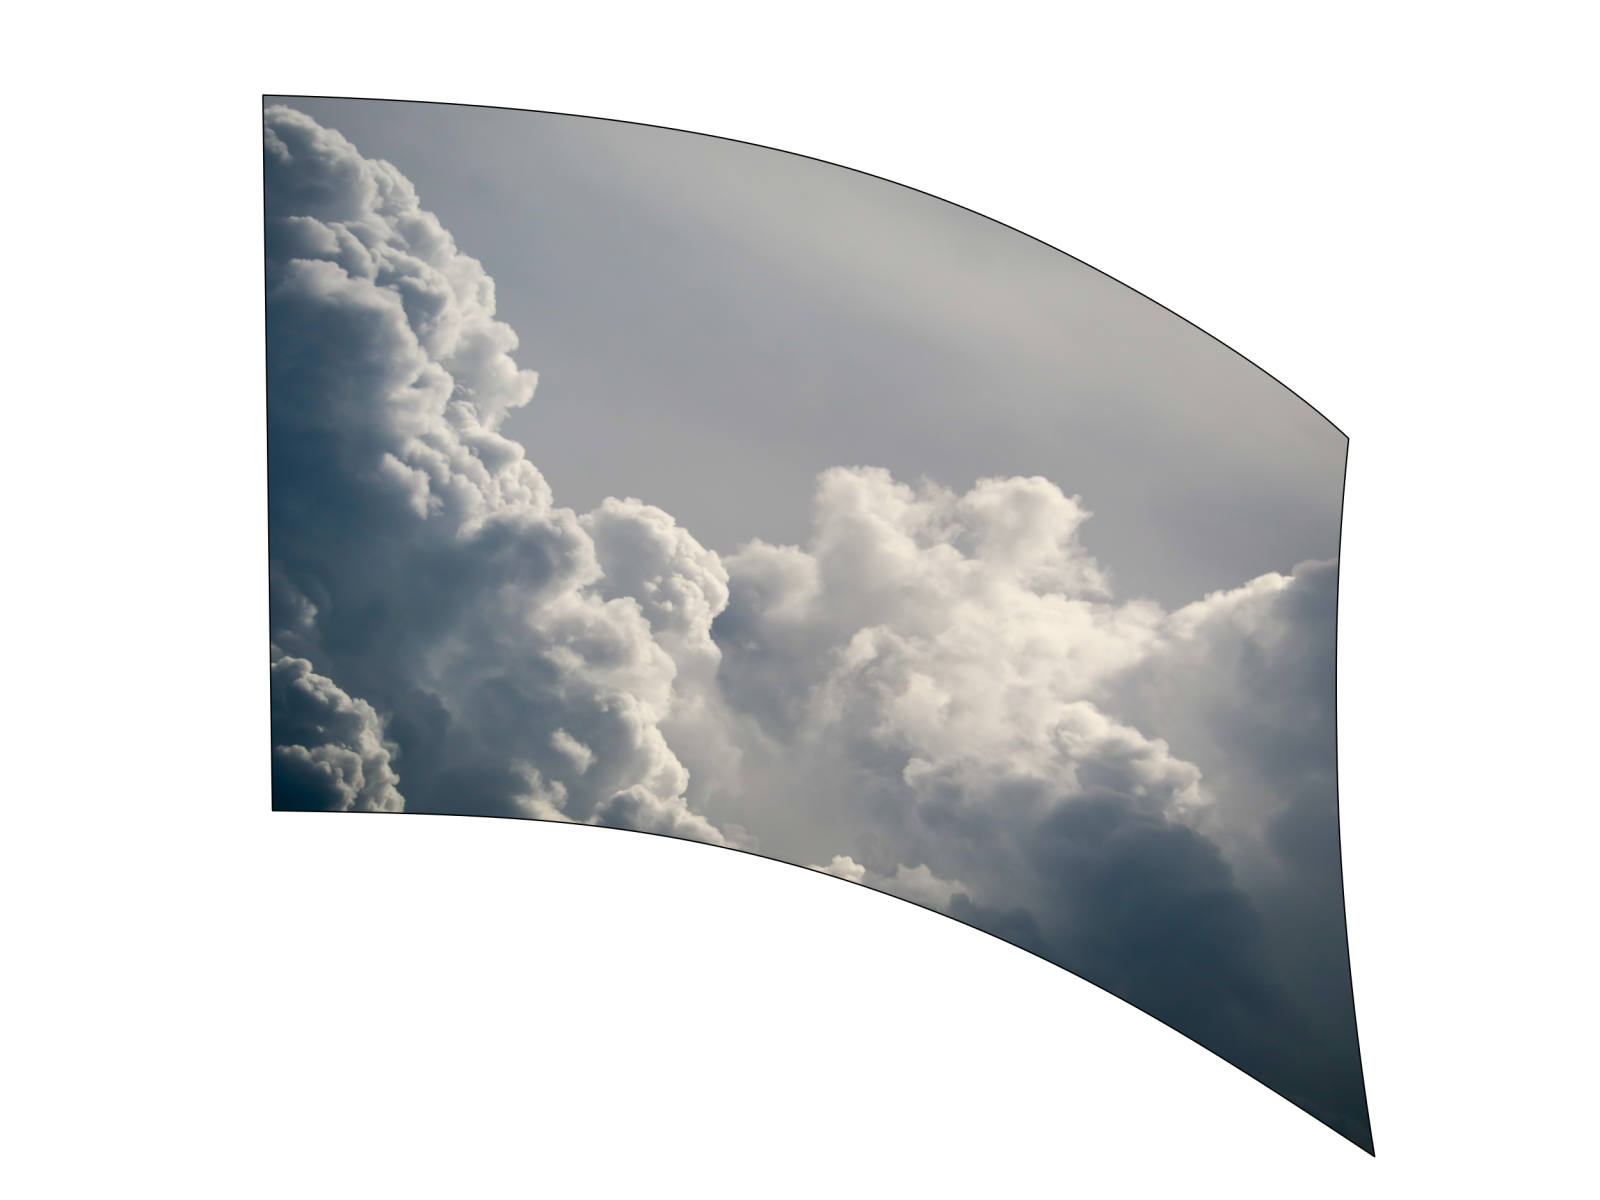 050314s - 36x52 Standard Storm Clouds 1